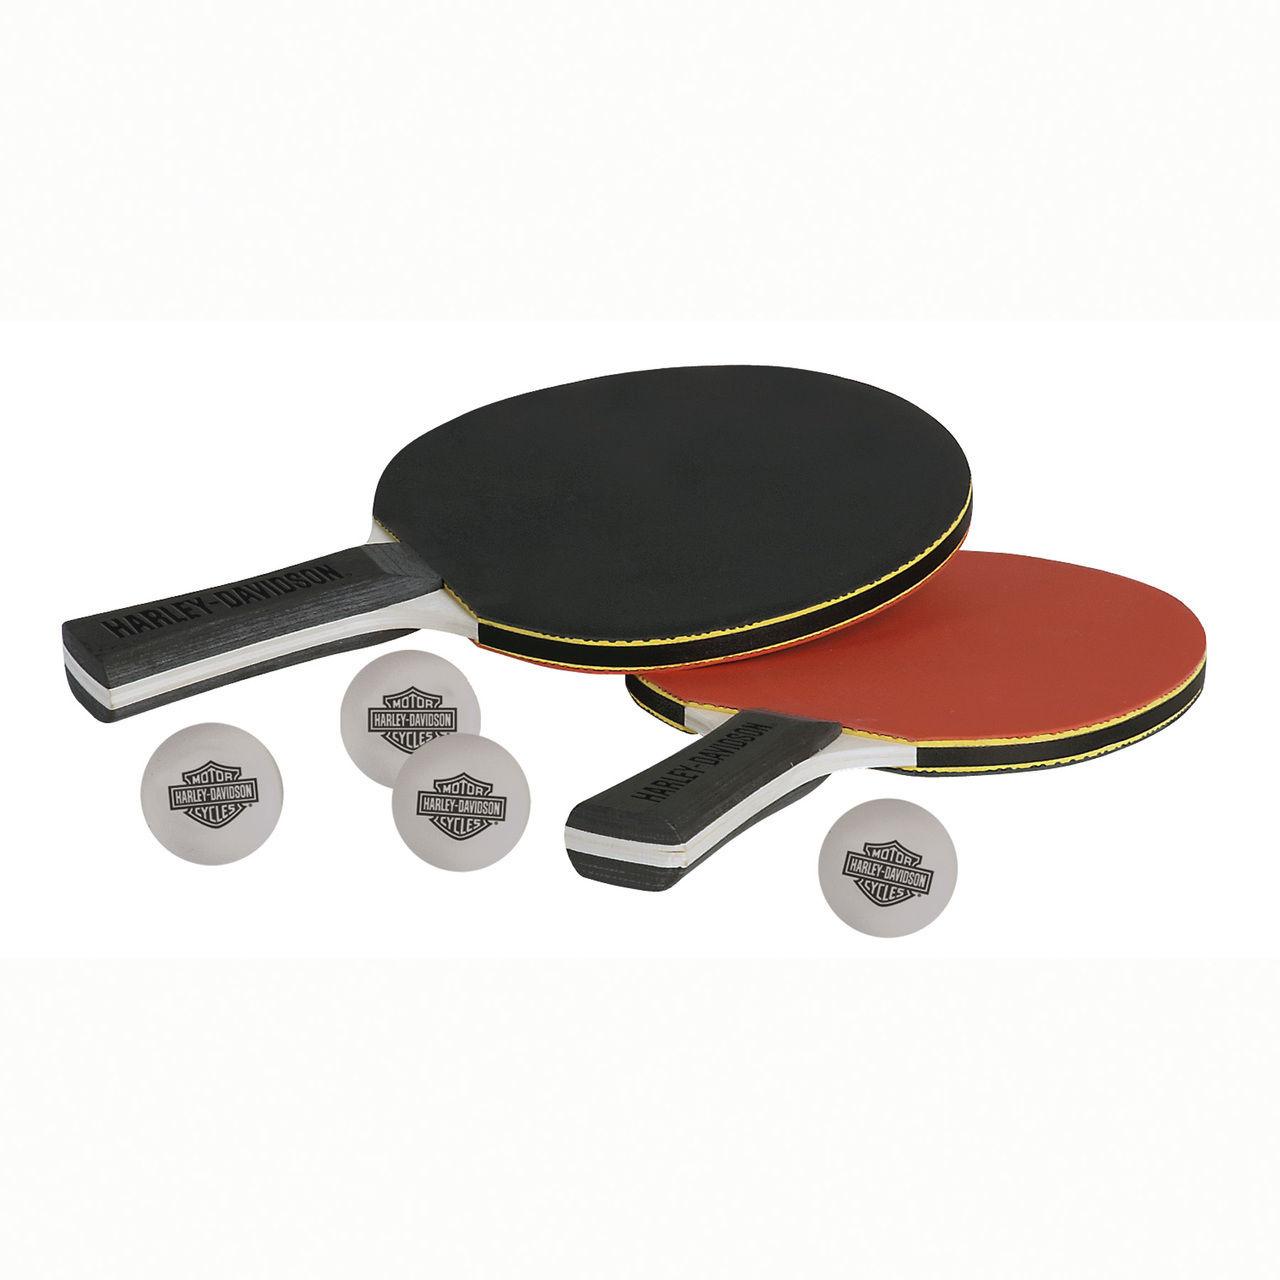 Harley-Davidson Table Tennis Paddle Set HDL-13704